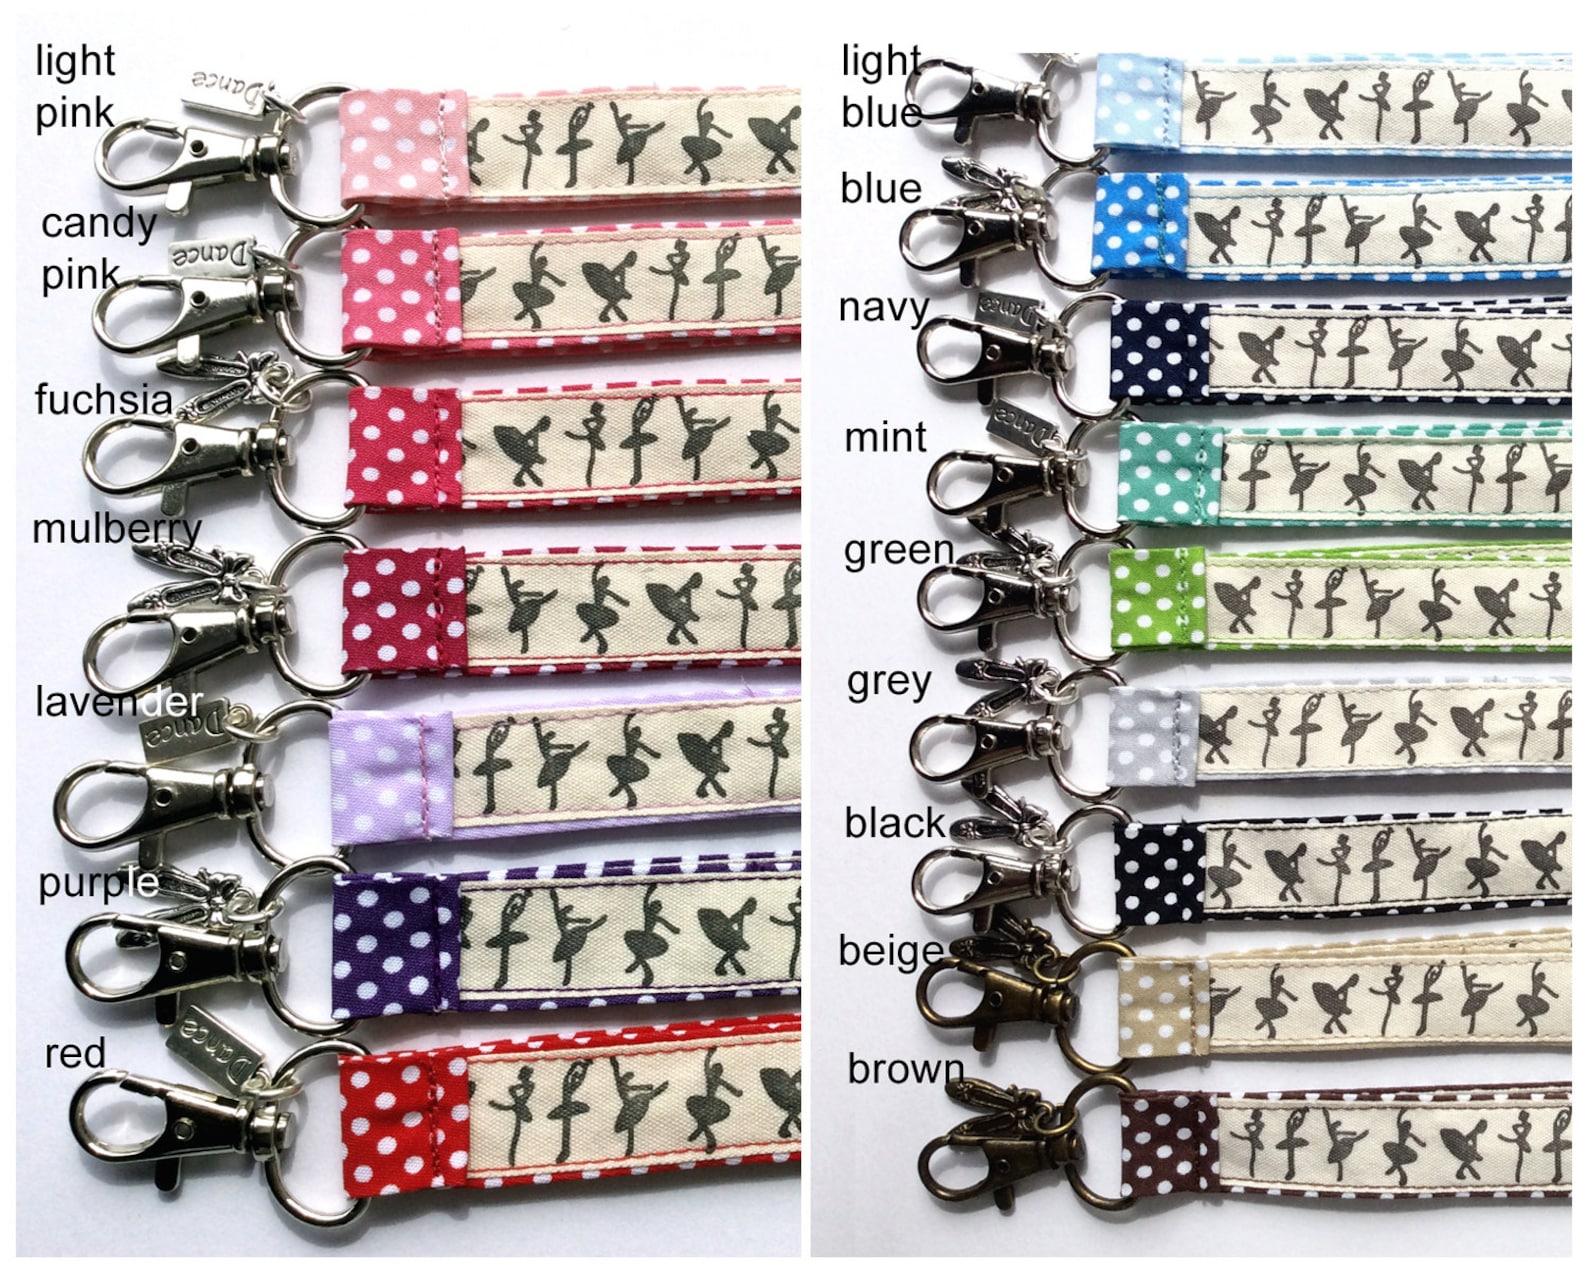 dance lanyard, ballet lanyard, ballerina lanyard, ballet keychain, dance key ring, id badge holder, dance gift, ballet gift